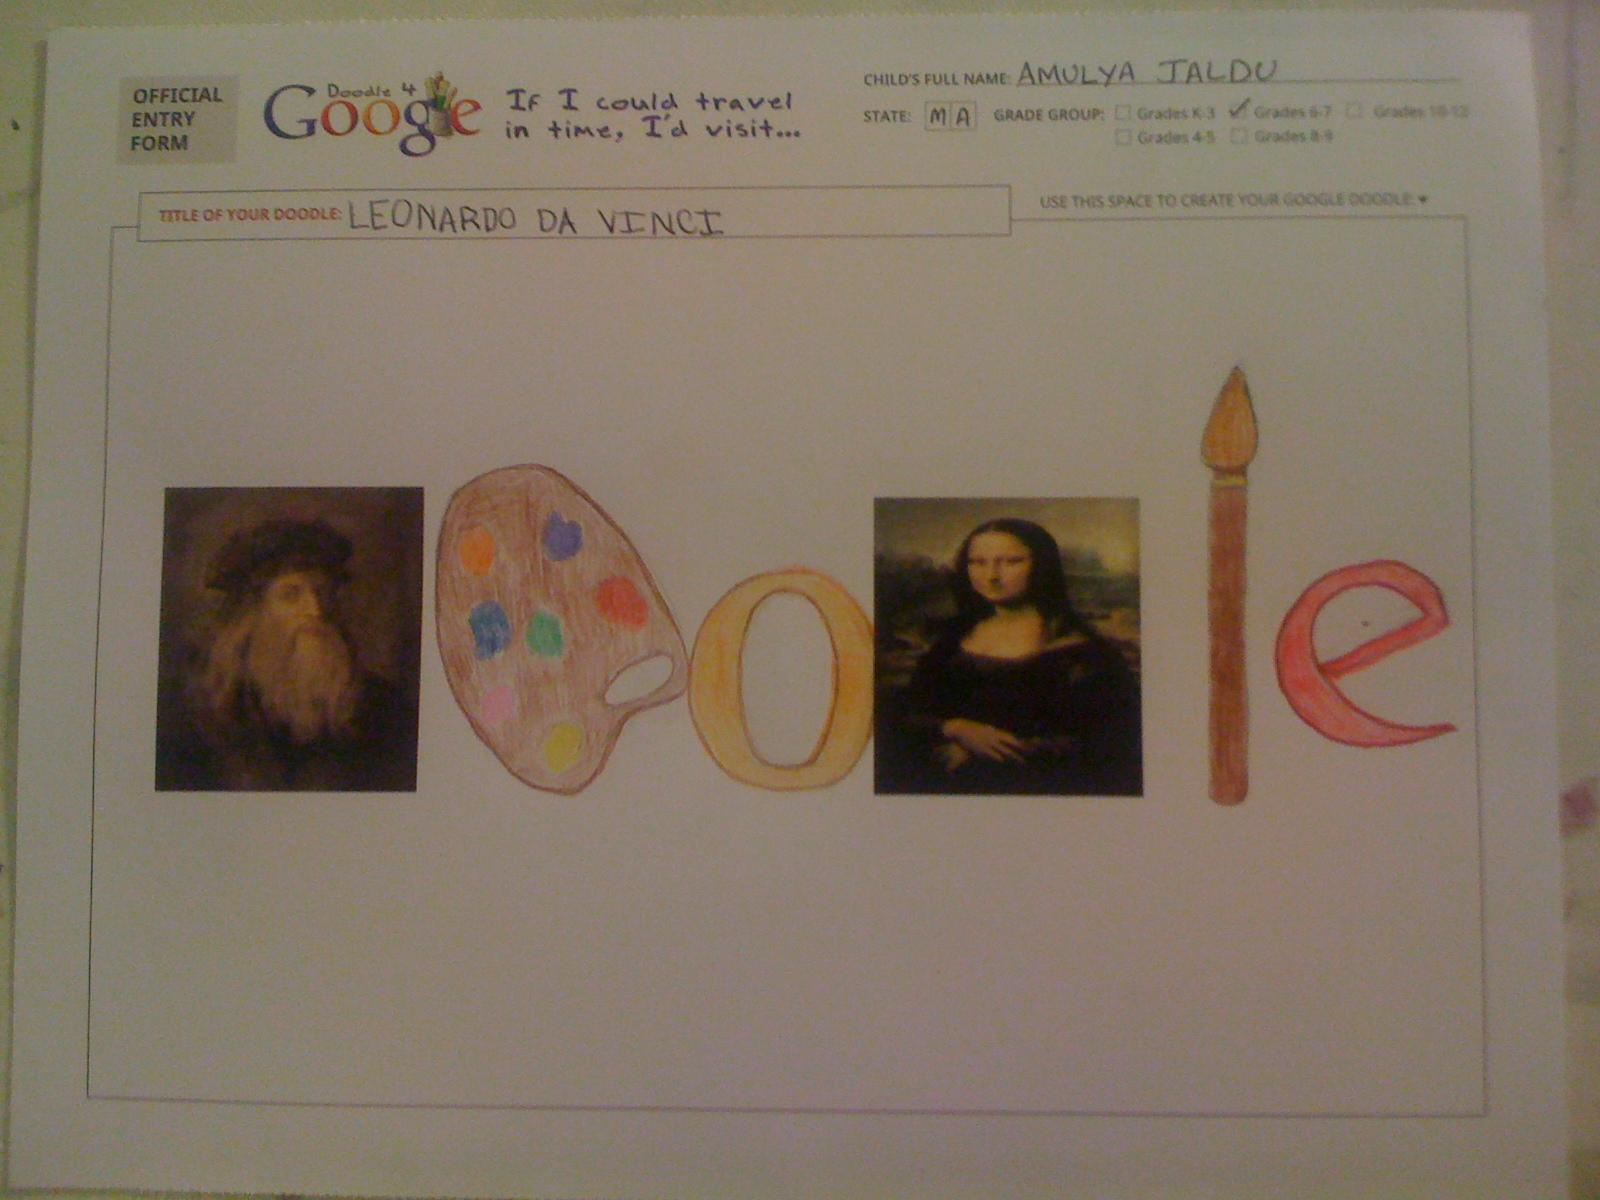 I'd Visit 'Leonardo Da Vinchi' -Amulya Jaldu(6th Grade)